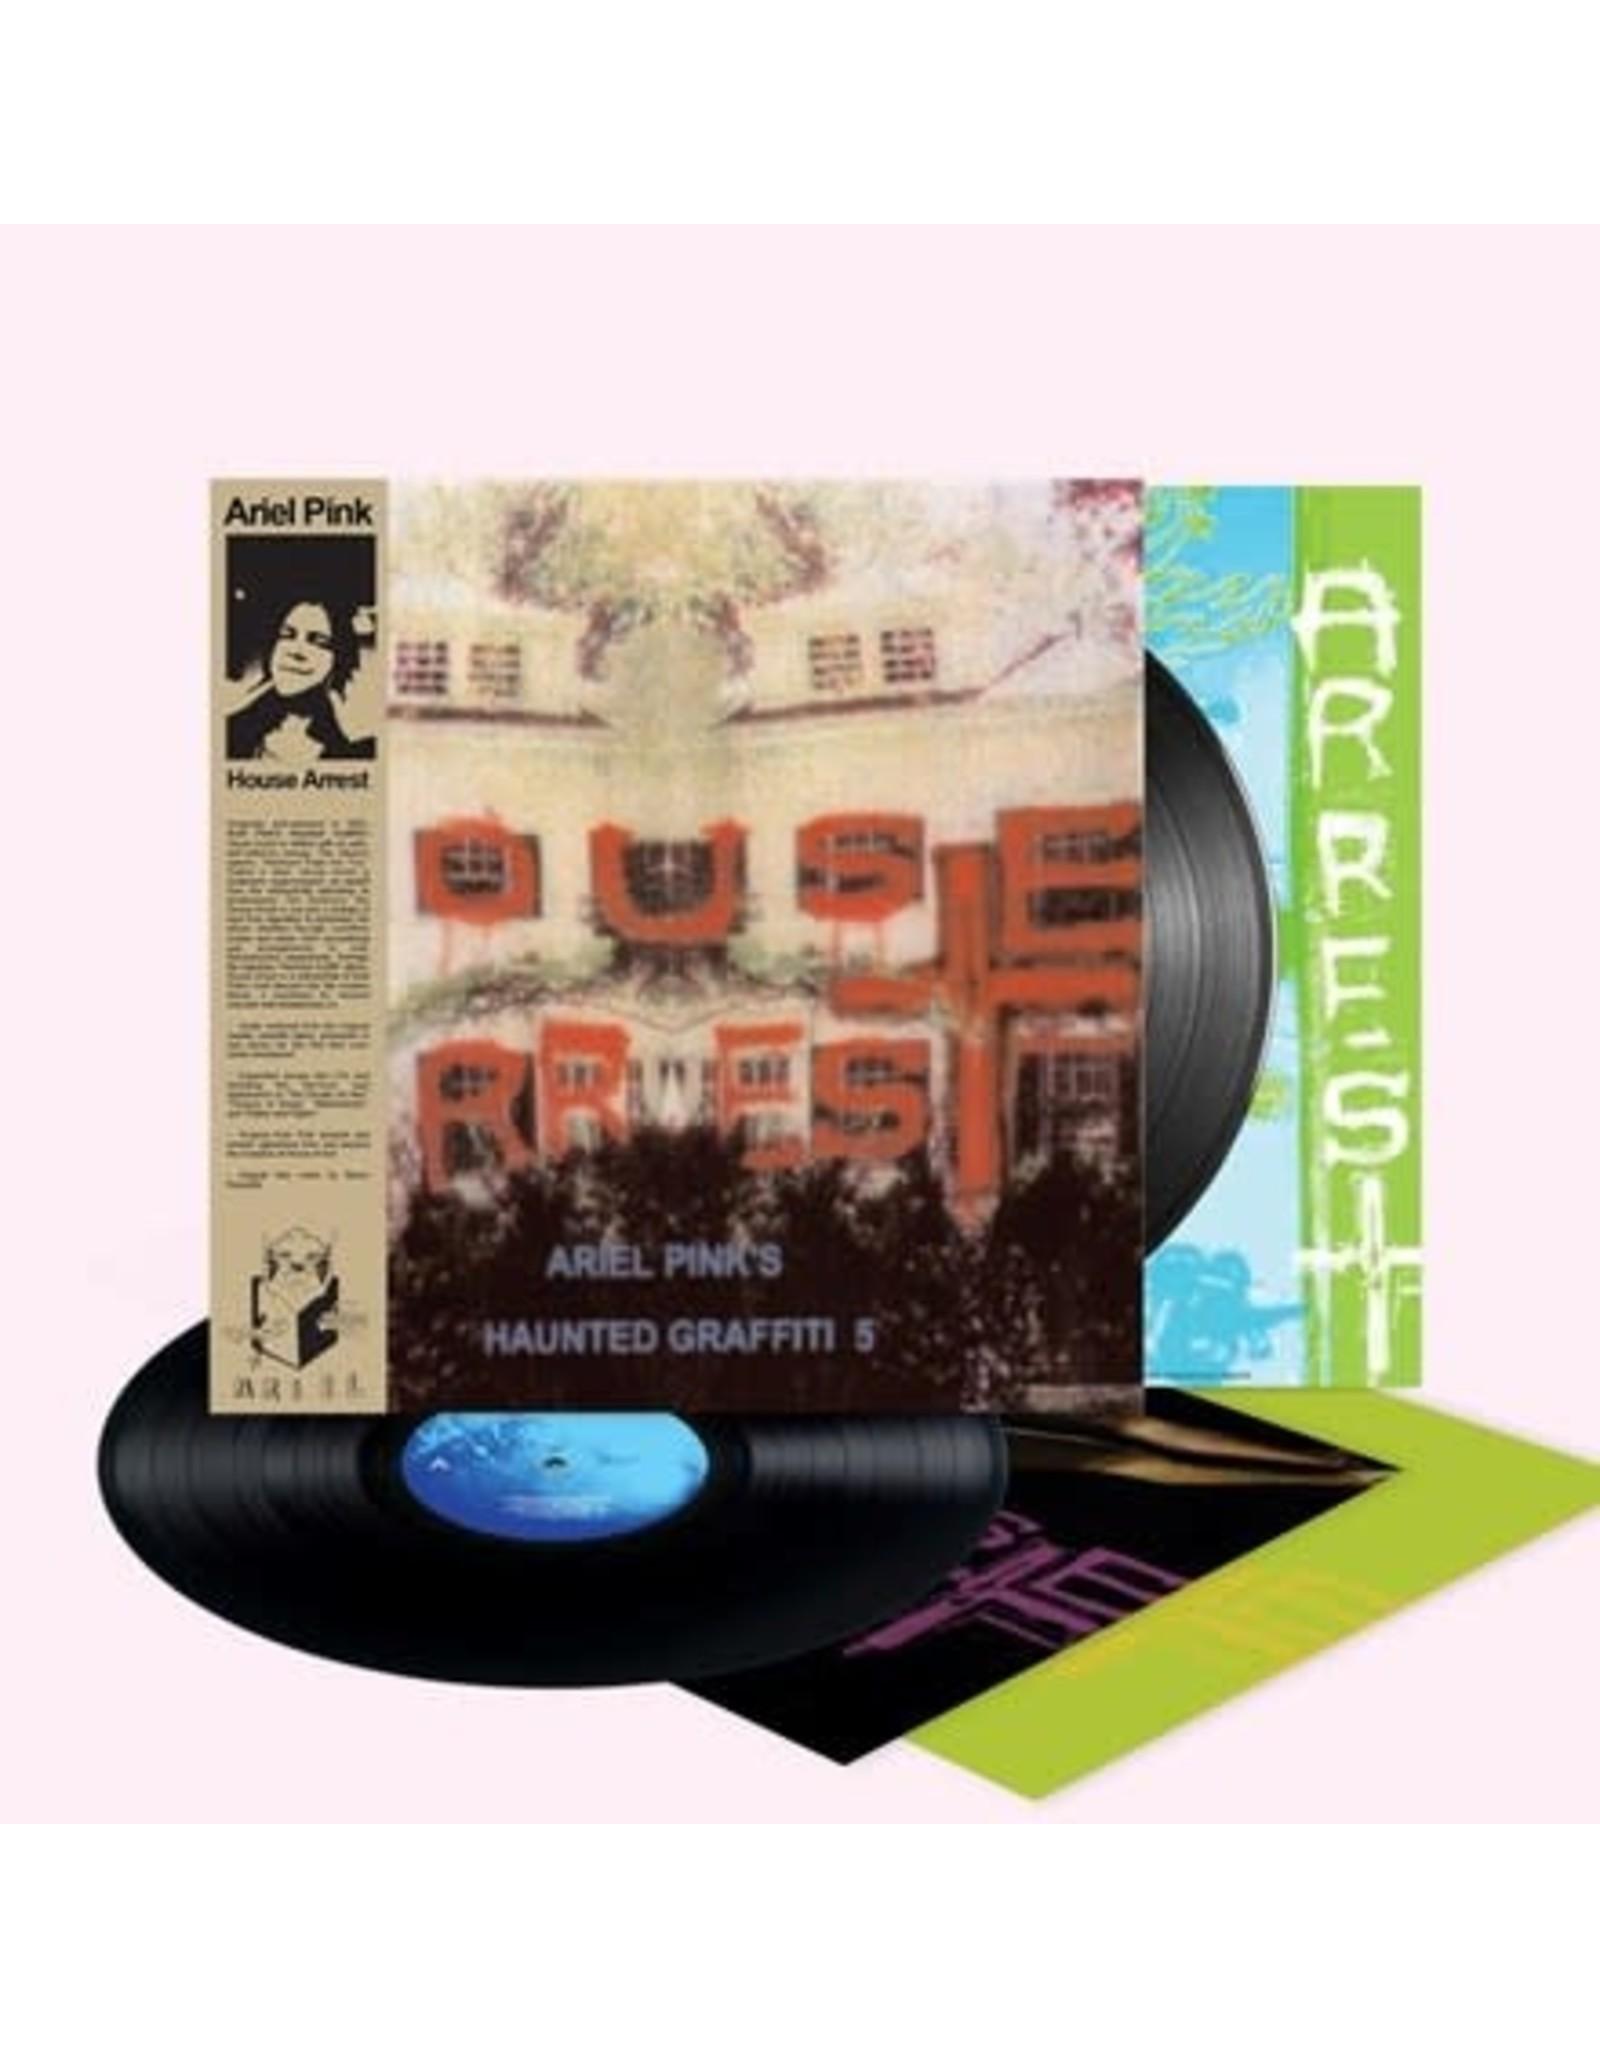 Mexican Summer Ariel Pink: House Arrest LP